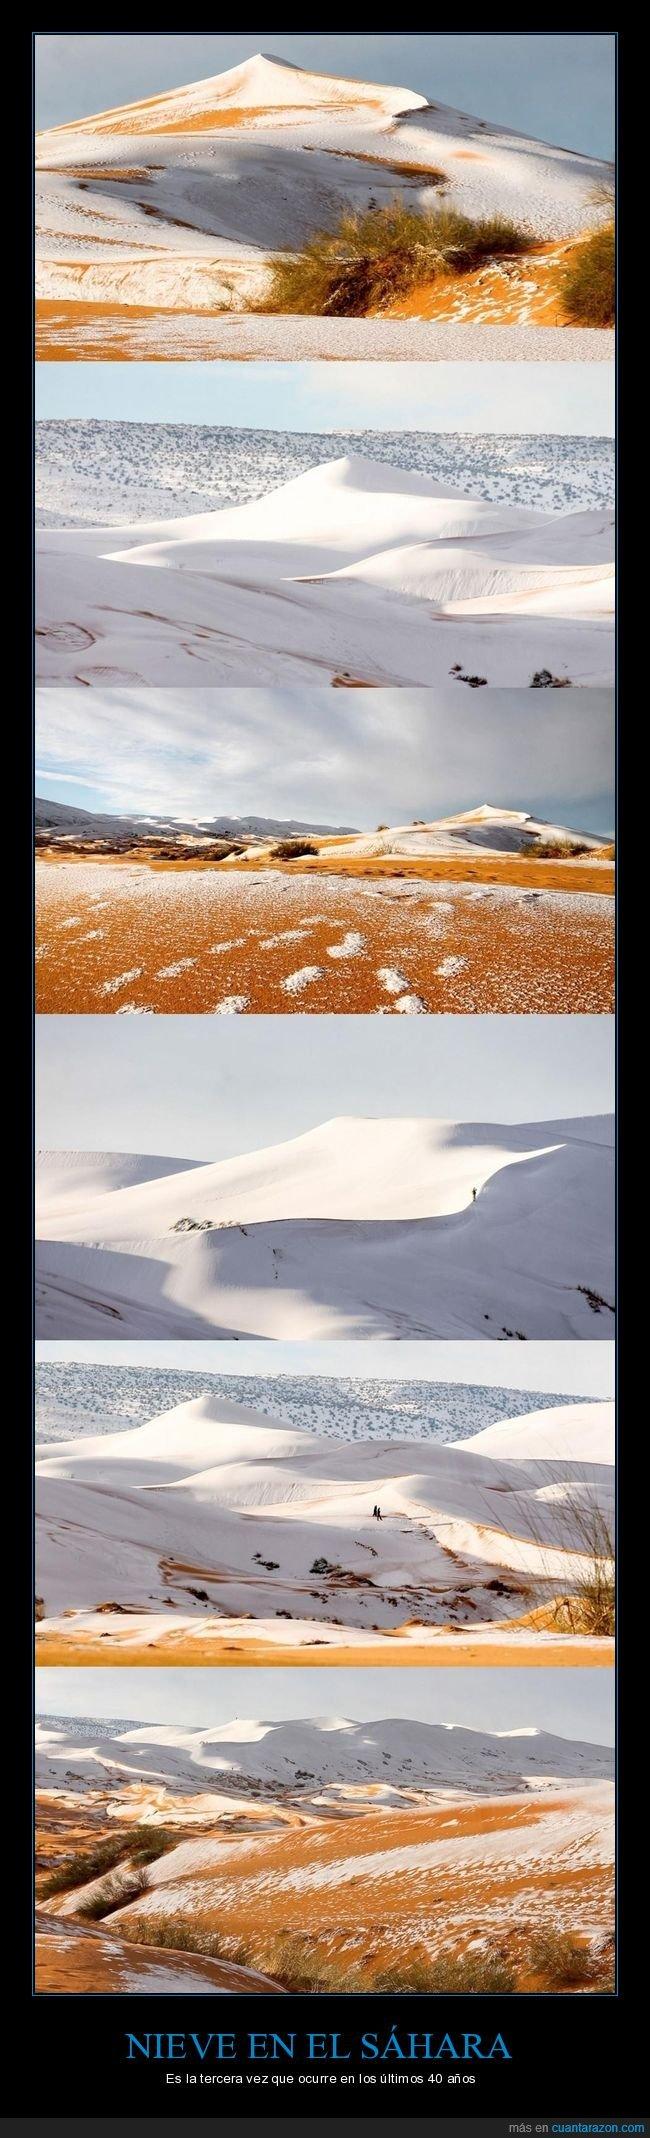 desierto,nieve,sáhara